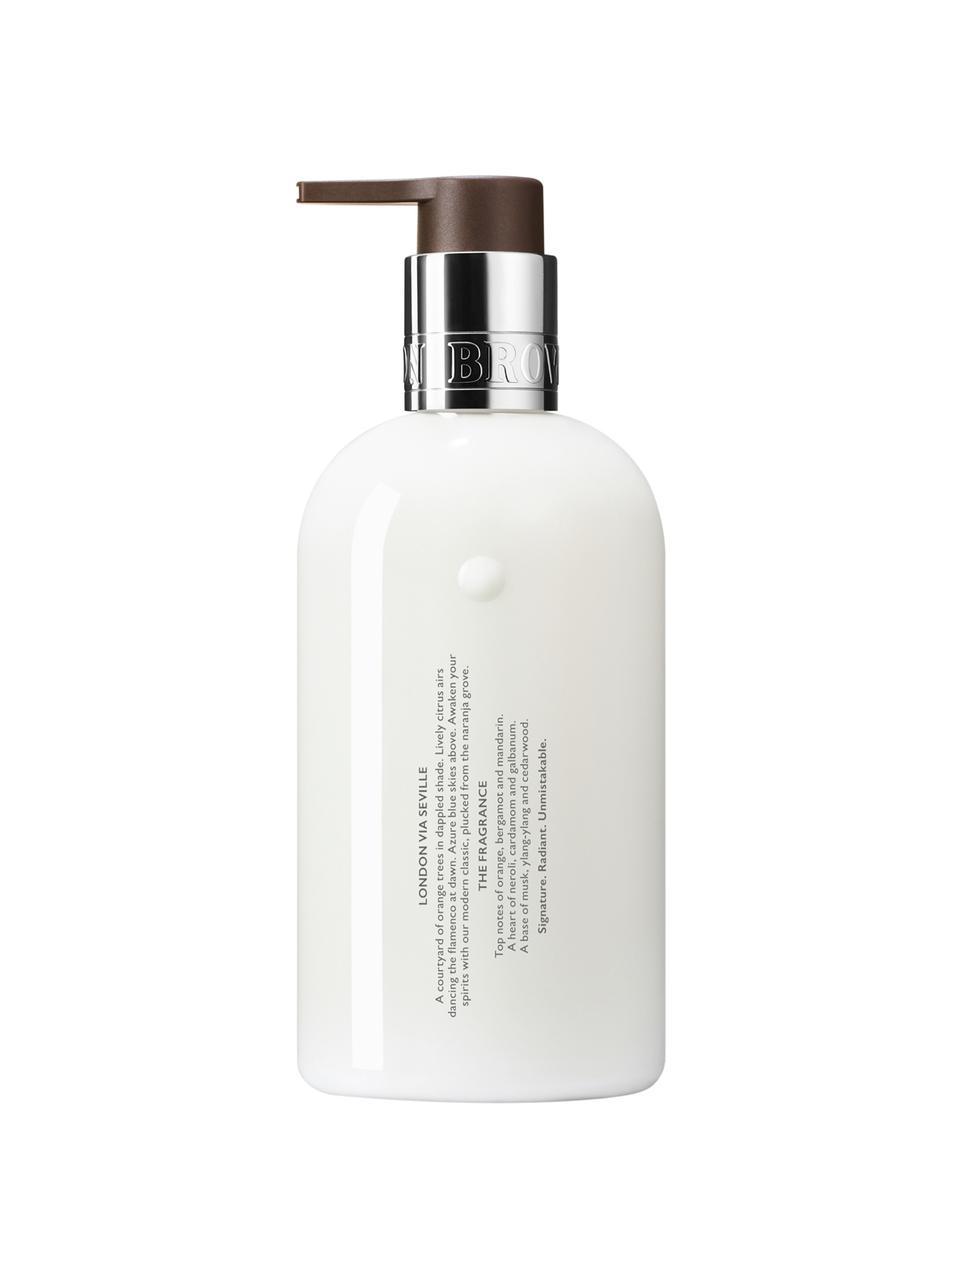 Handcreme Molton (Orange & Bergamotte), Behälter: Recycelbarer Kunststoff, Weiß, Ø 6 x H 15 cm